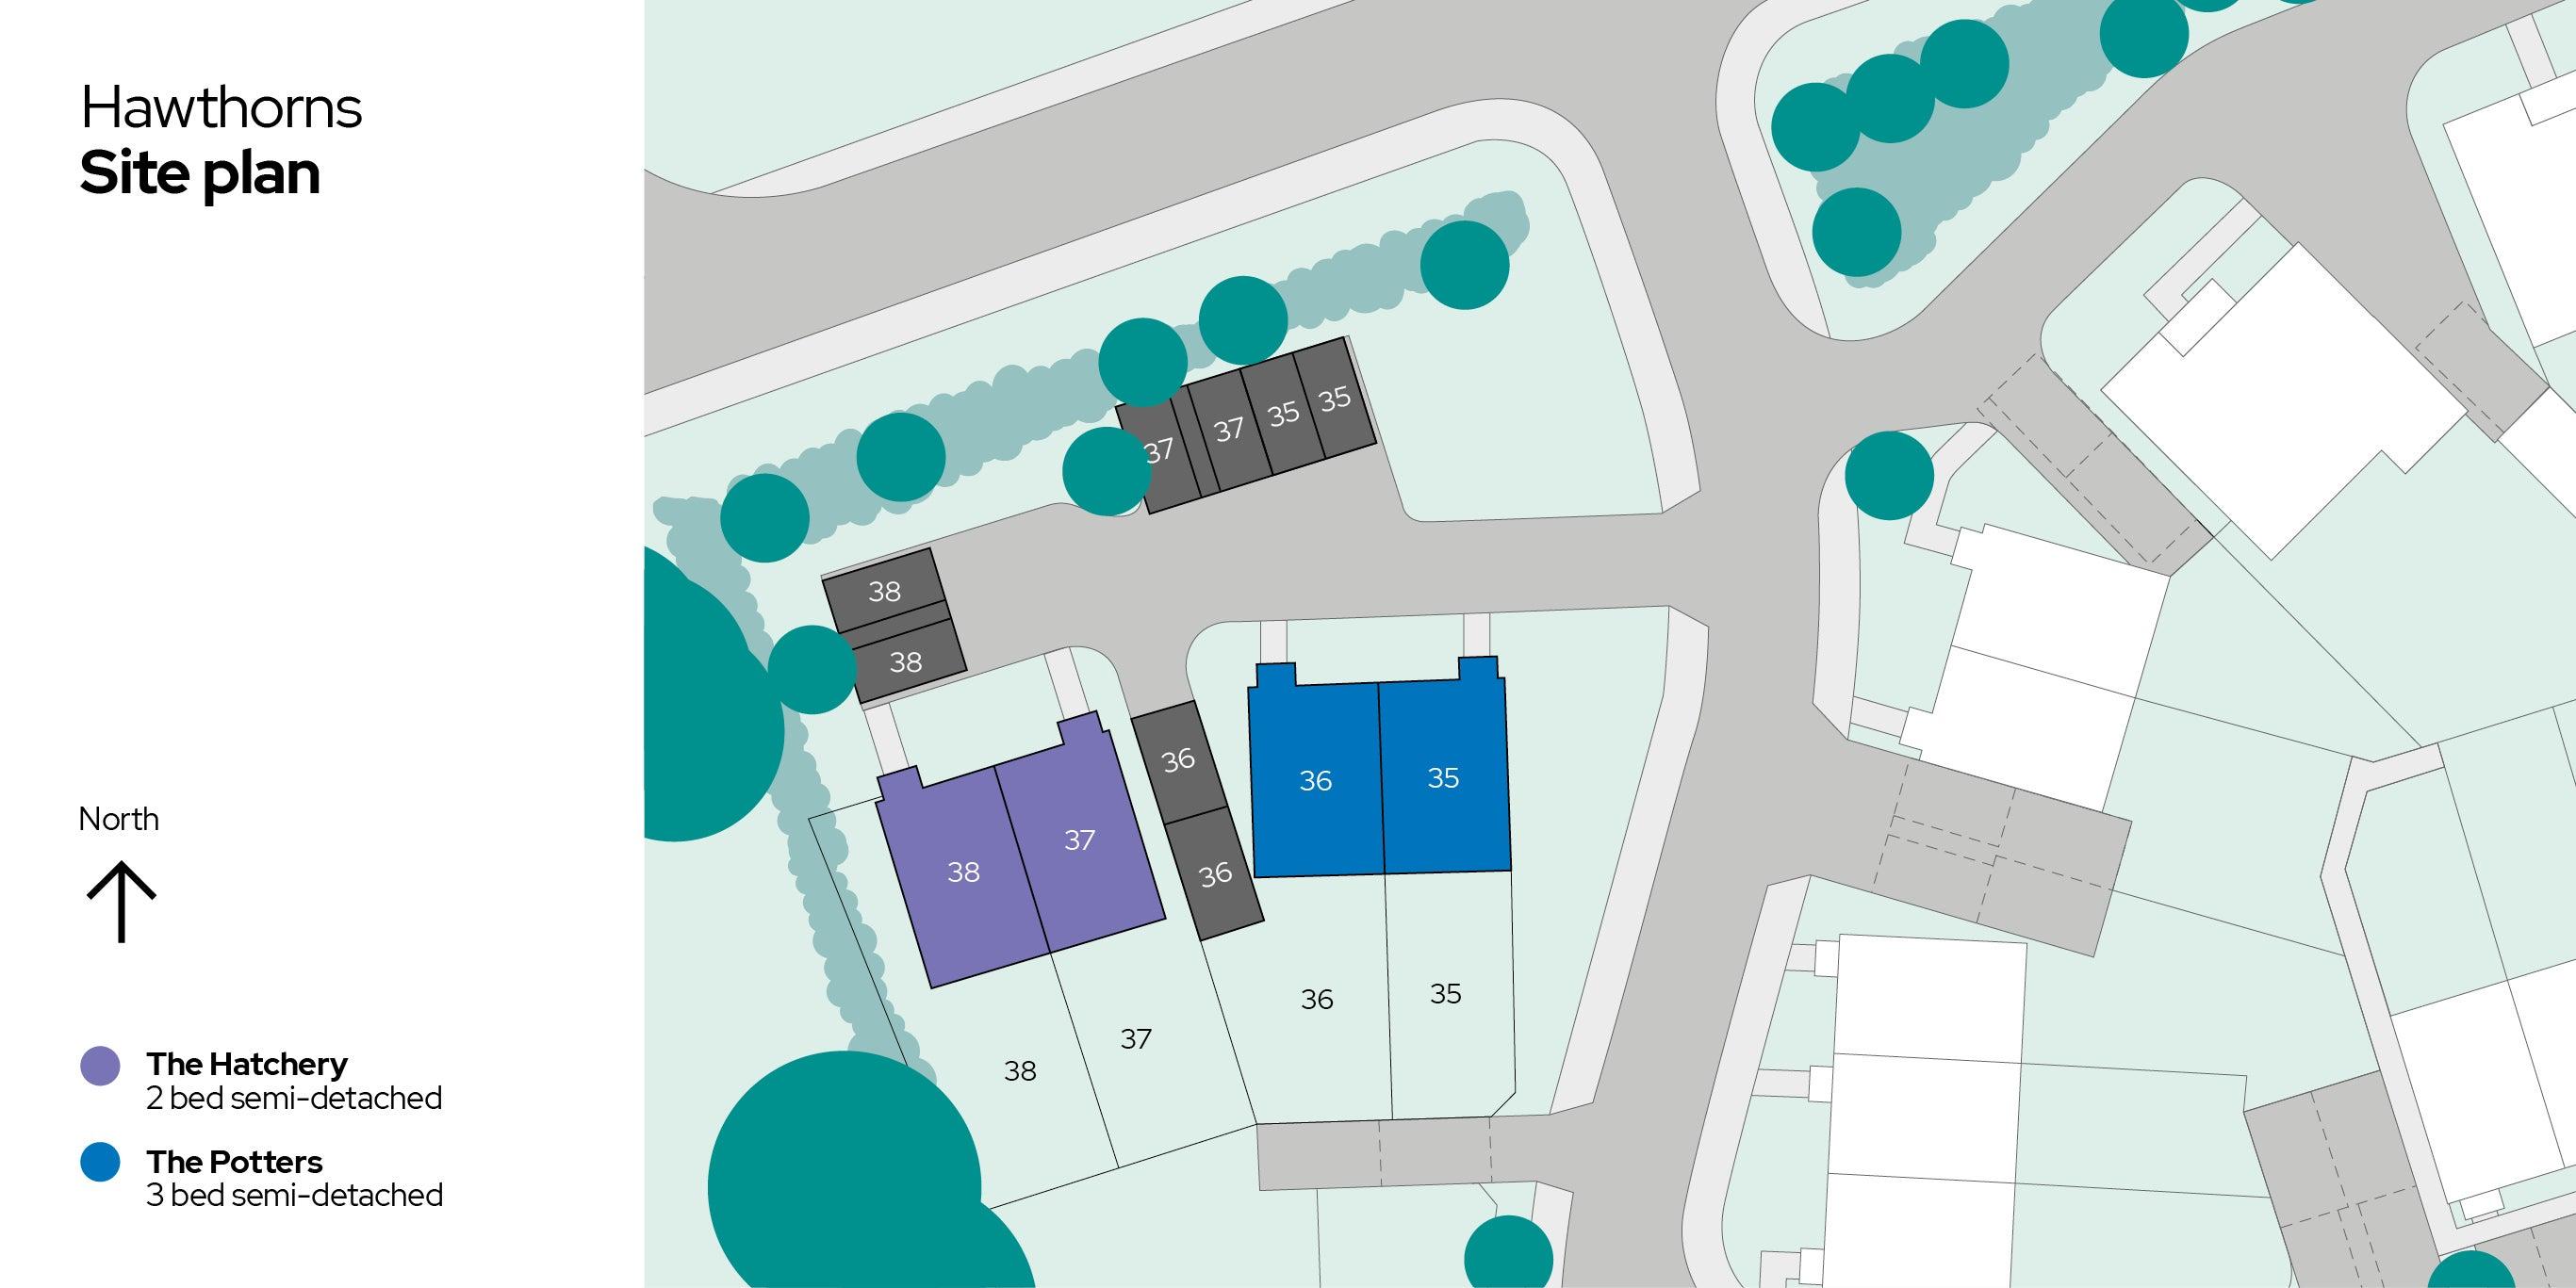 Hawthorns image of site plan